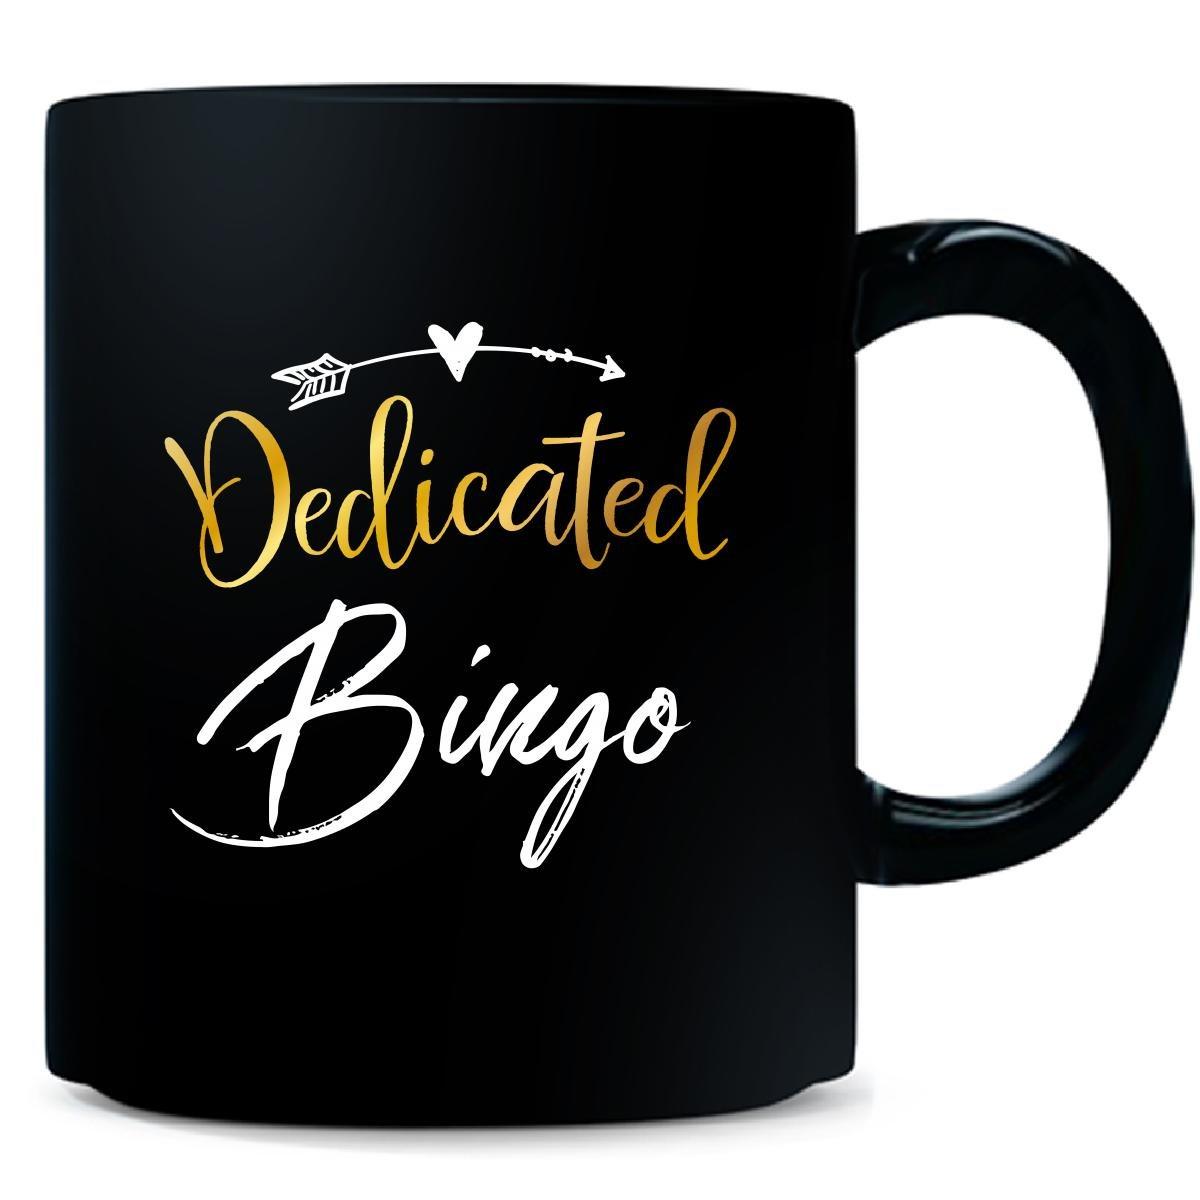 Dedicated Bingo Name Mothers Day Present Grandma - Mug by My Family Tee